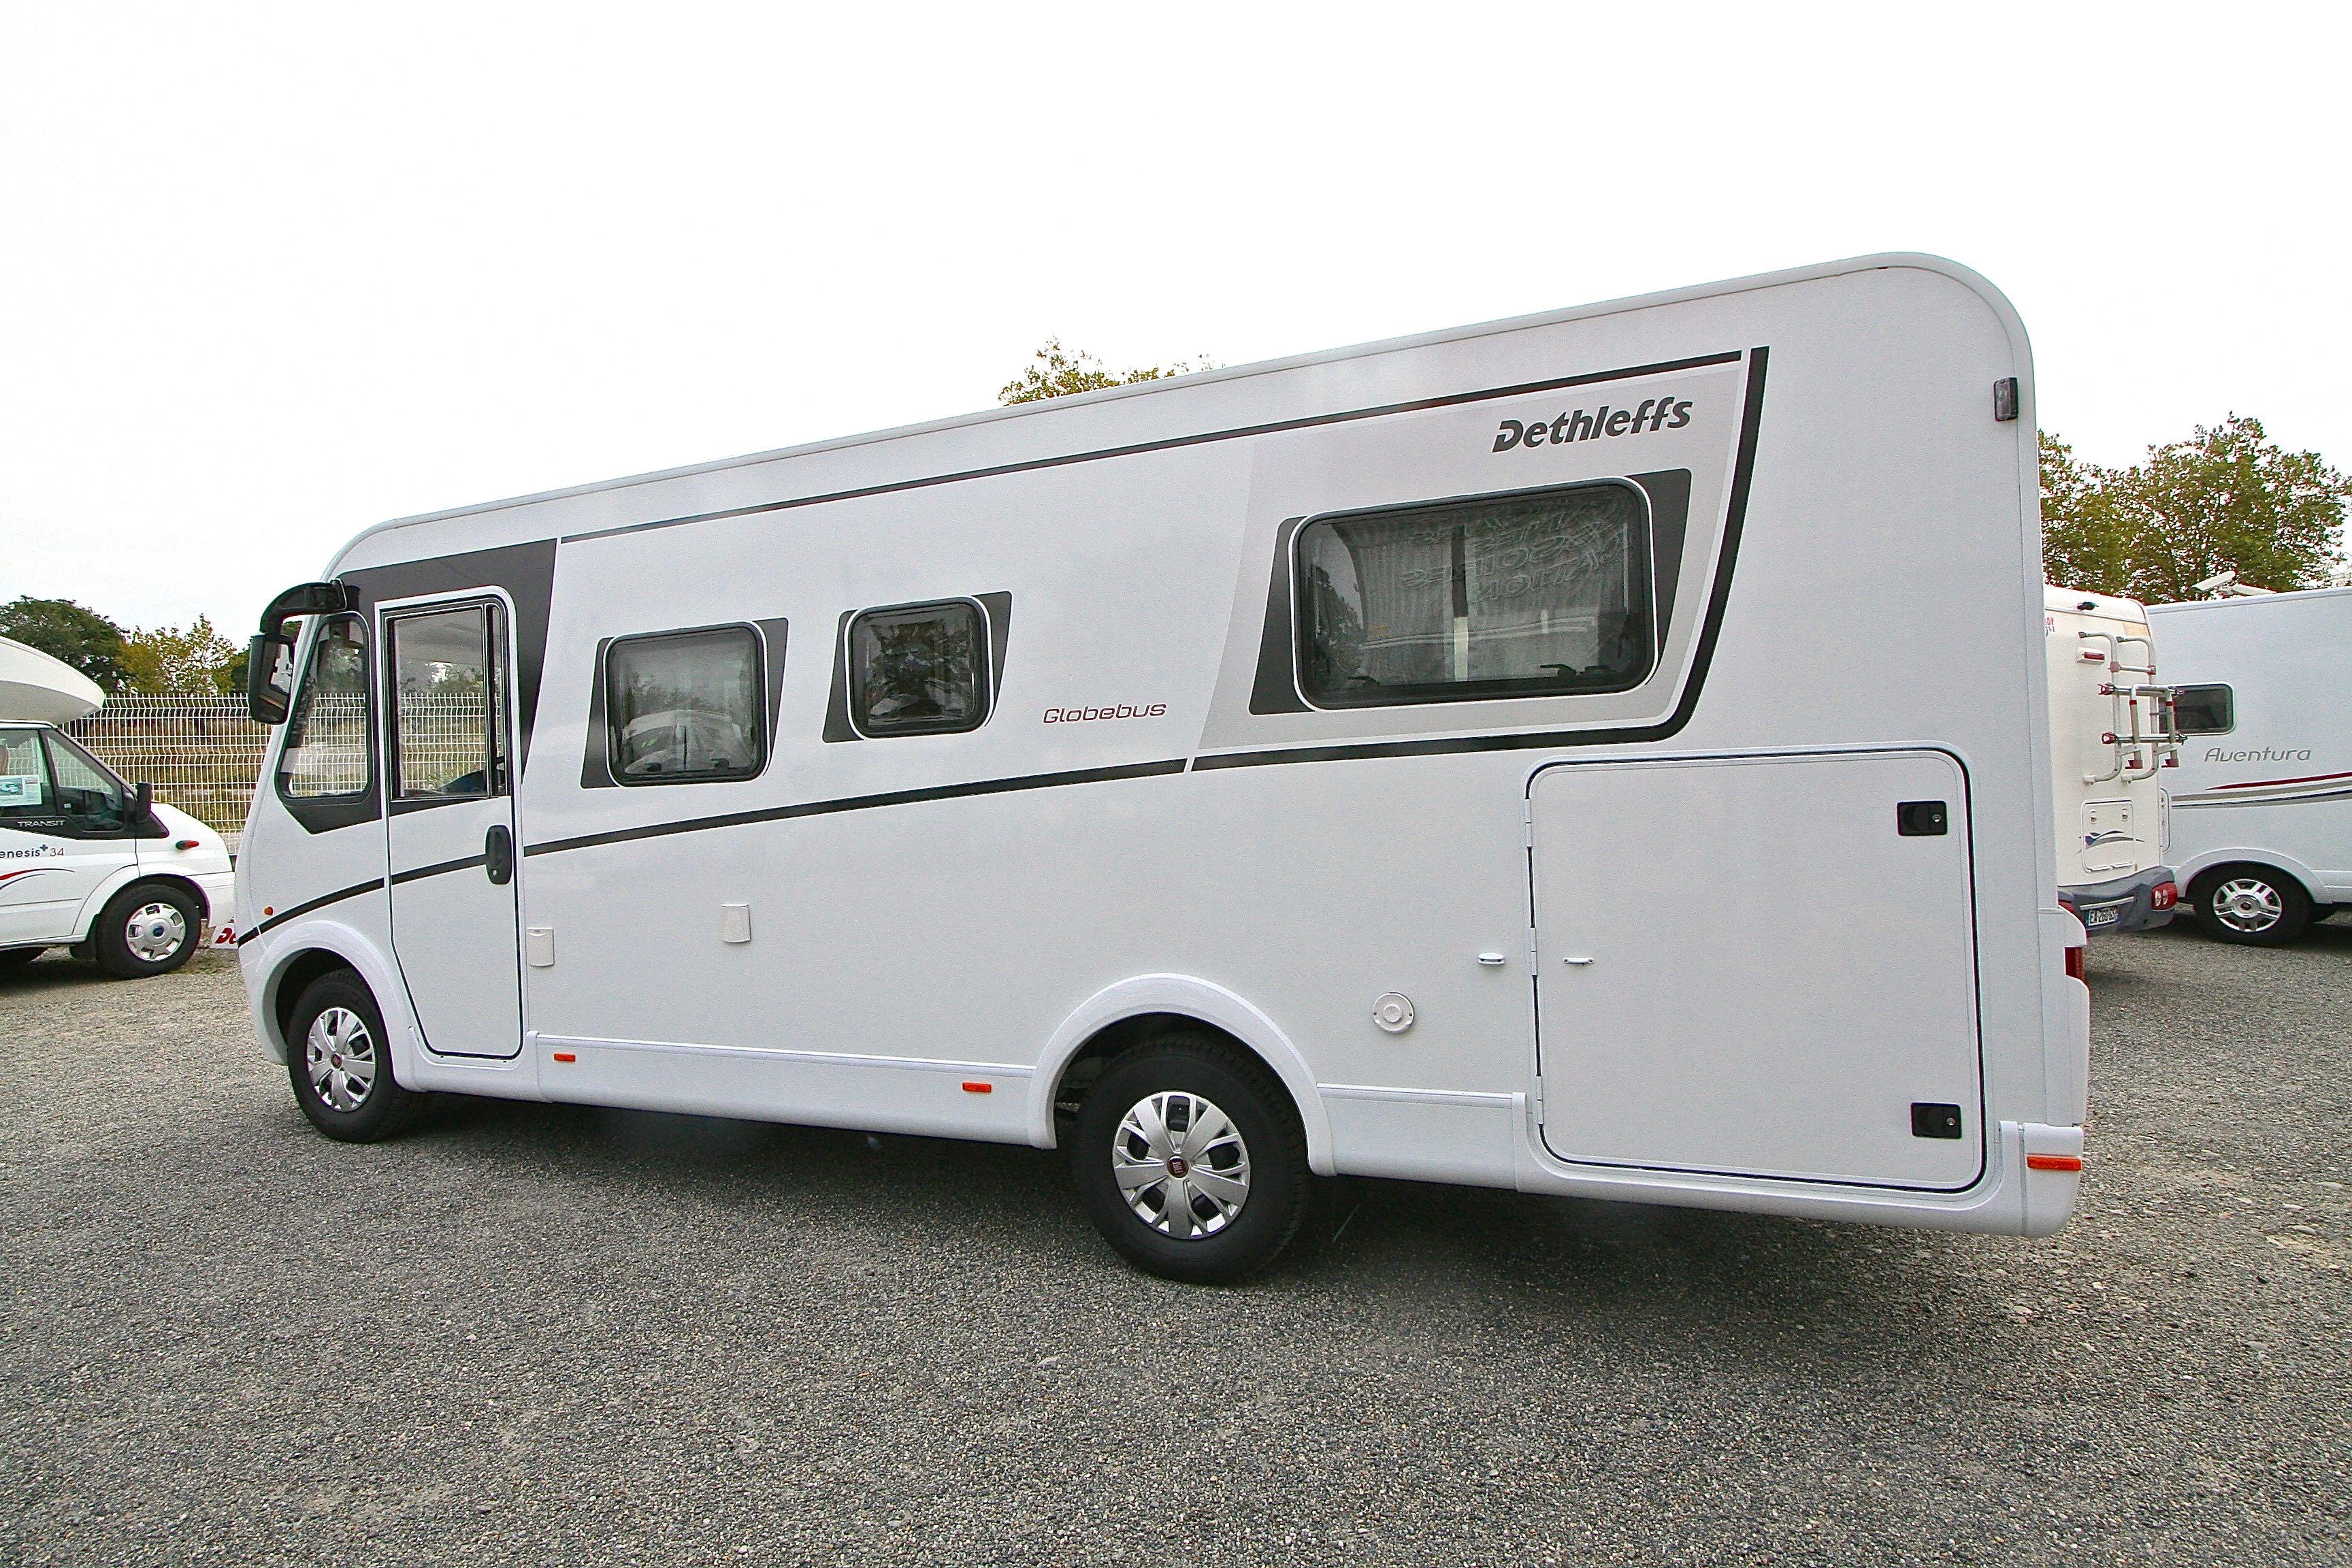 dethleffs globebus i 7 neuf fiat camping car en vente roques sur garonne haute garonne 31. Black Bedroom Furniture Sets. Home Design Ideas